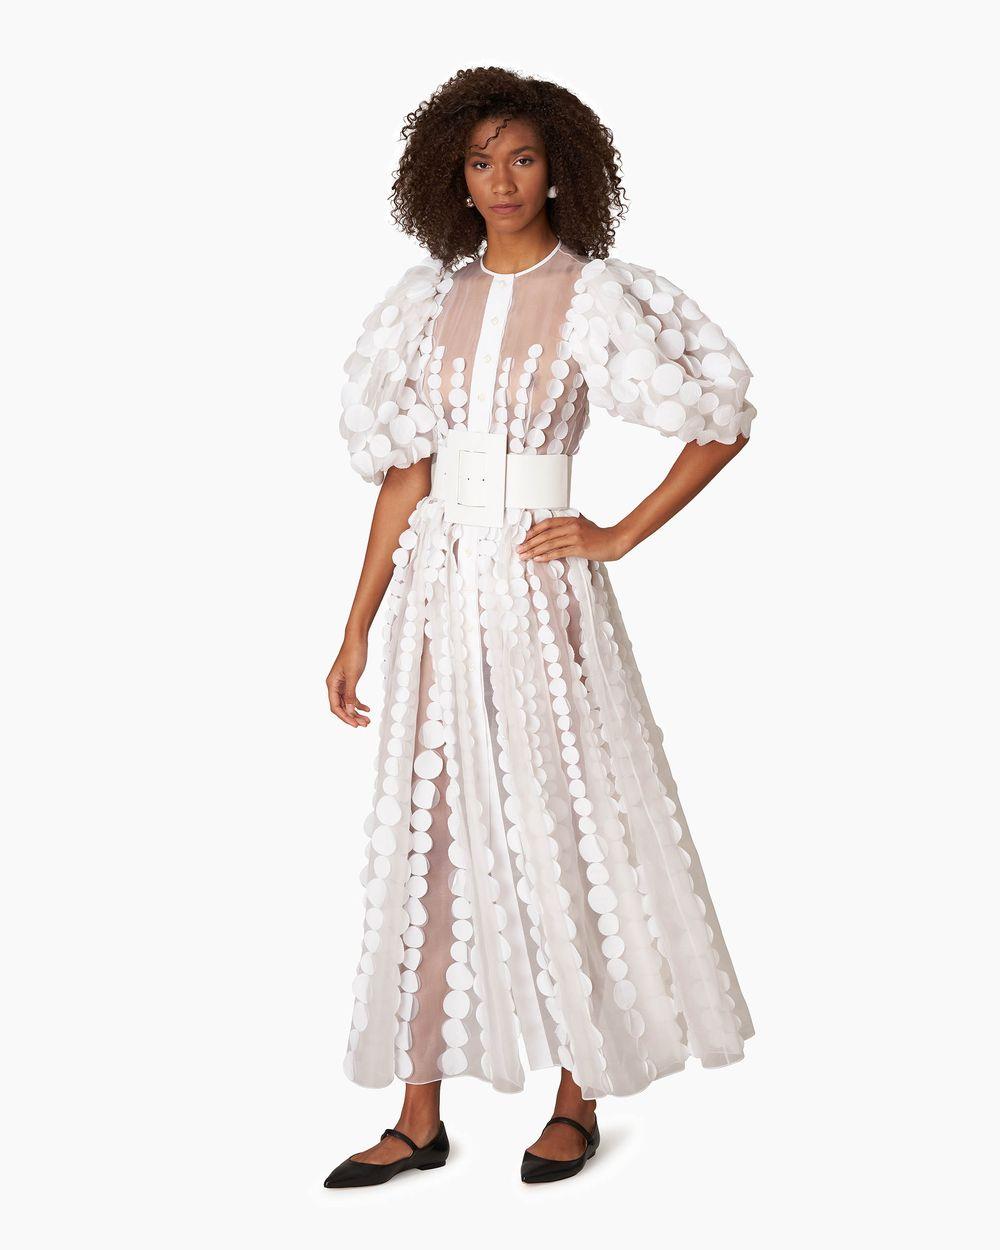 Details about  /Carolina Herrera Navy Blue White Sequin-embellished Silk Faille Dress